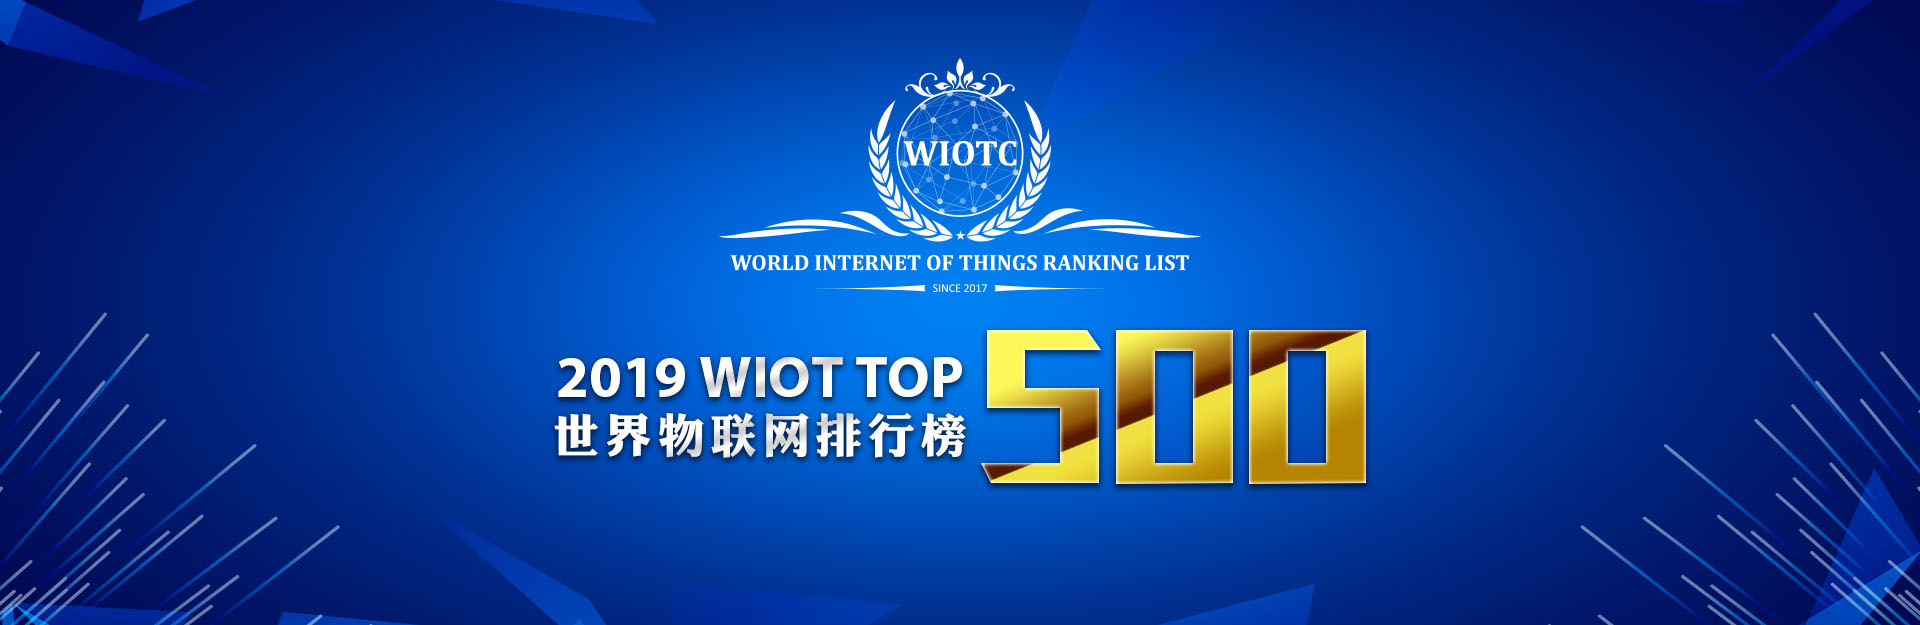 2019 World Internet of Things Ranking List